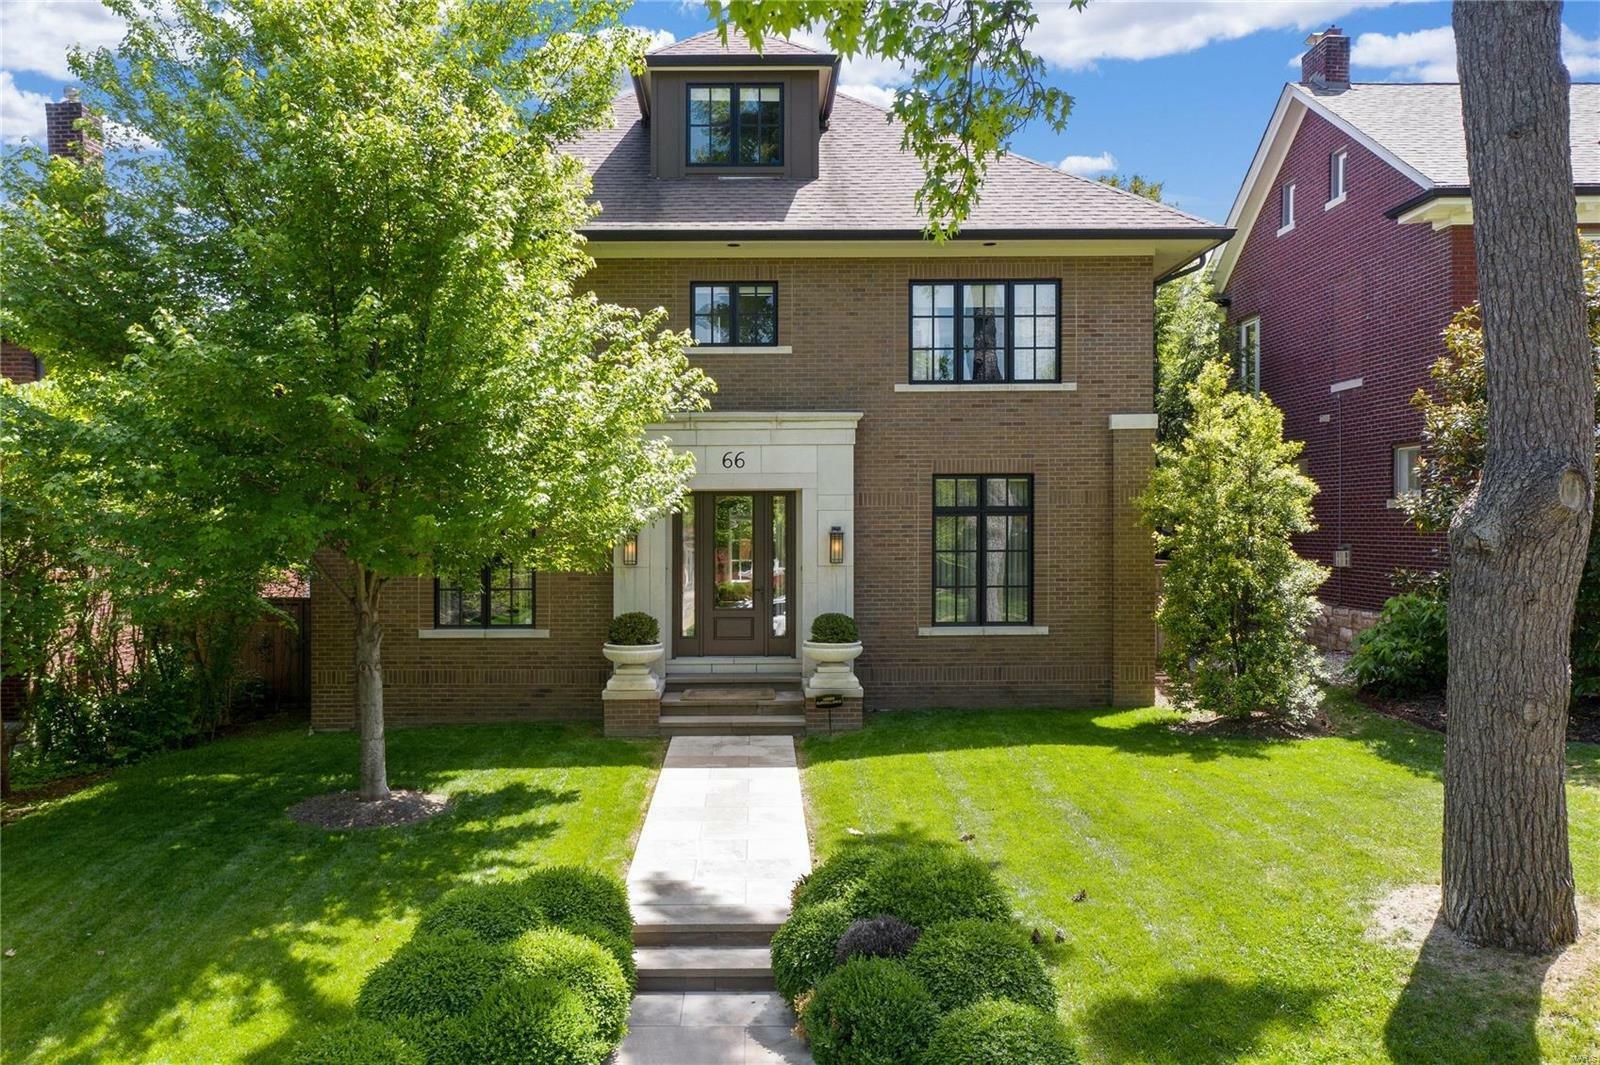 House in Clayton, Missouri, United States 1